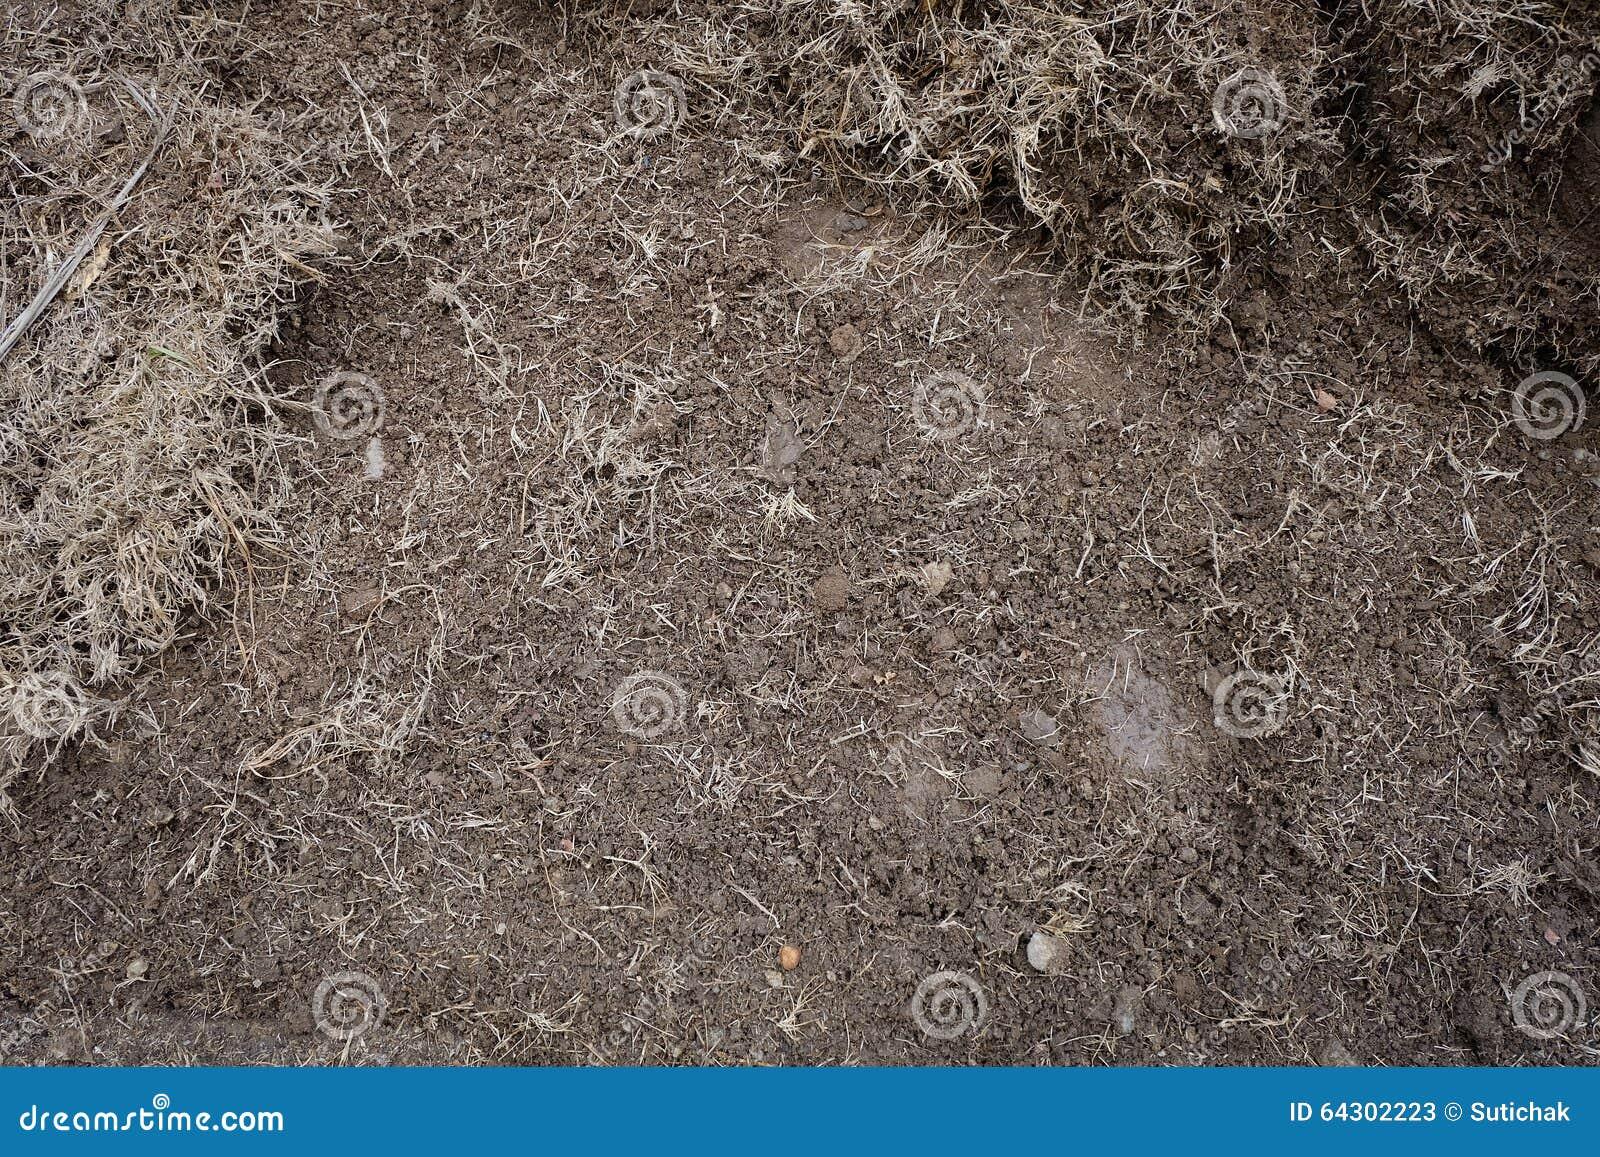 Yard work preparation soil in garden stock photo image 64302223 - Gardening works in october winter preparations ...